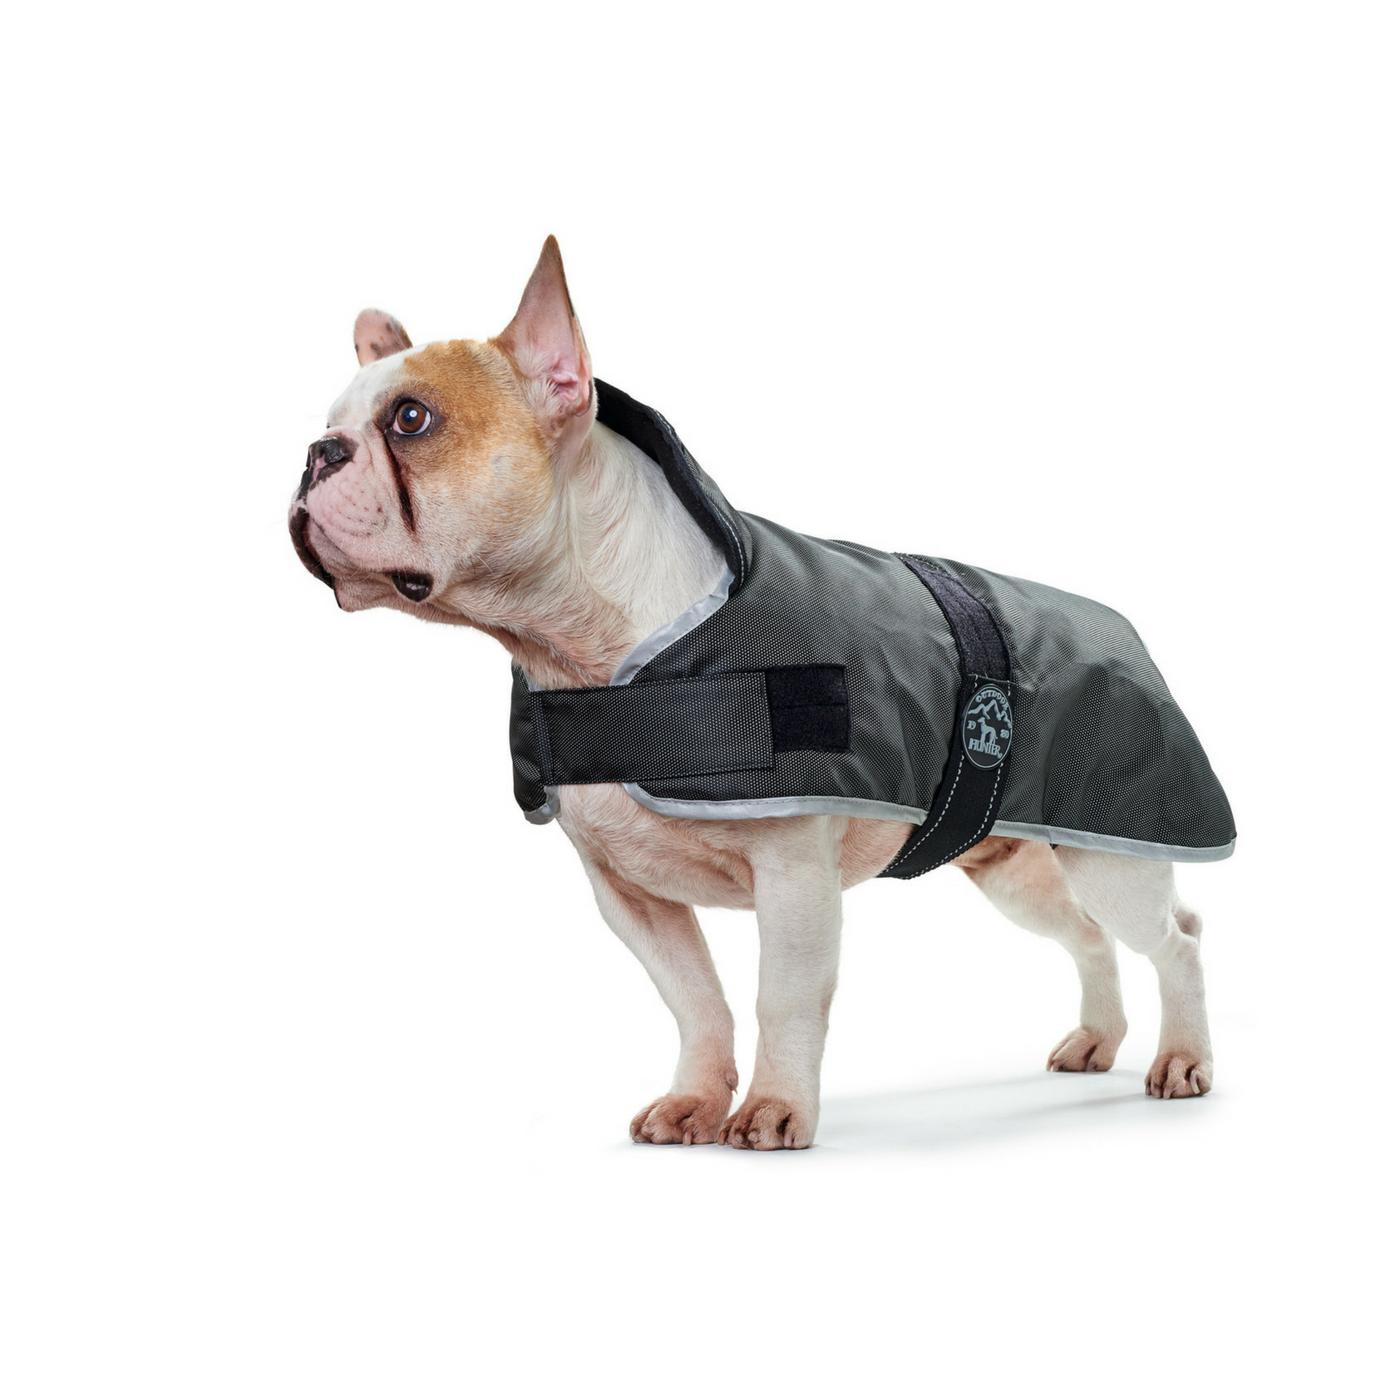 Cappottino Denali Hunter Grigio per Cani - GEA Pet Shop - 606d051b2e5a